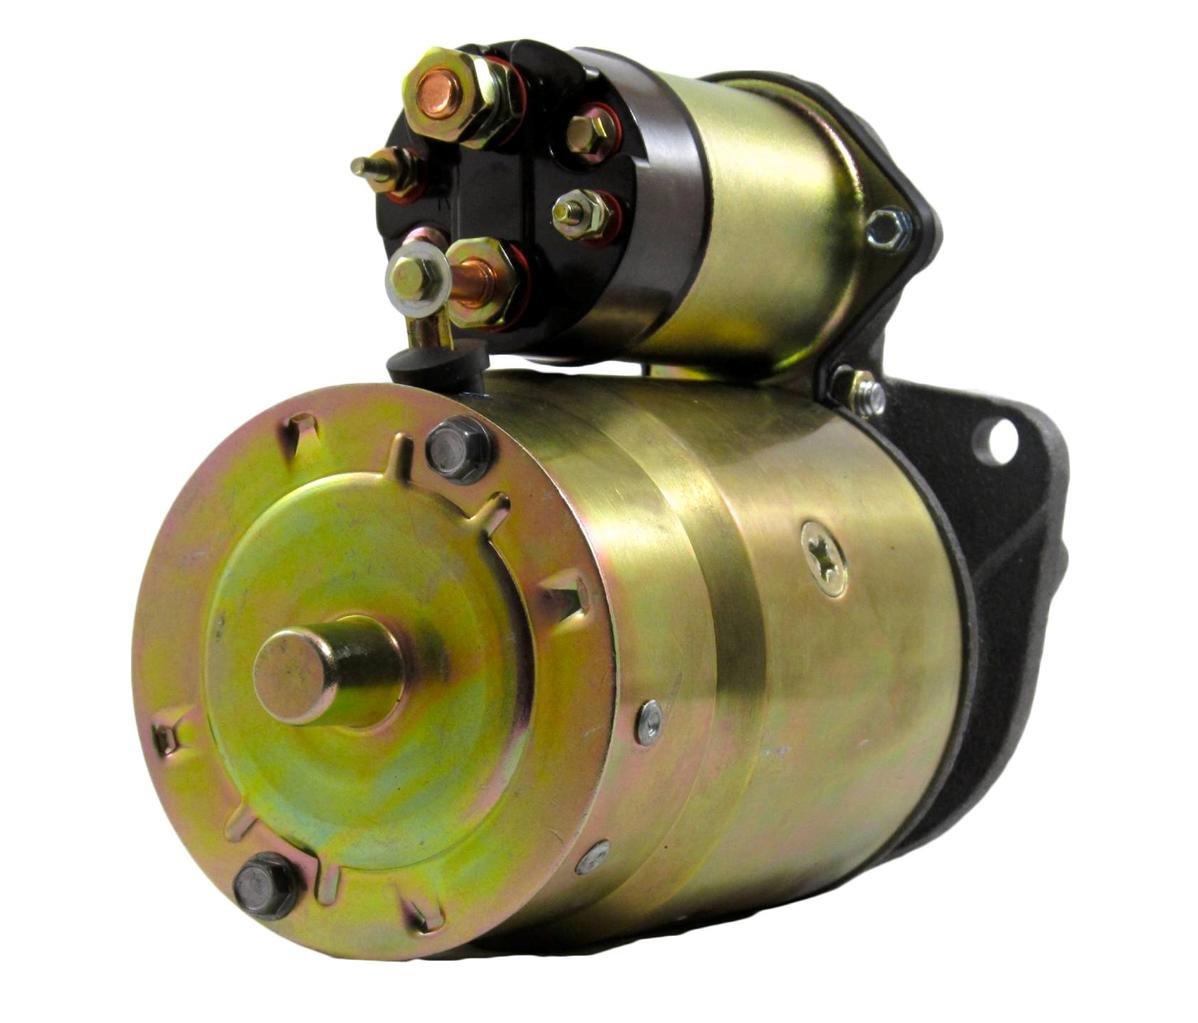 NEW STARTER MOTOR FITS WISCONSIN ENGINE VH4D VG4D VF4D V465 YA60 10455339  10455354